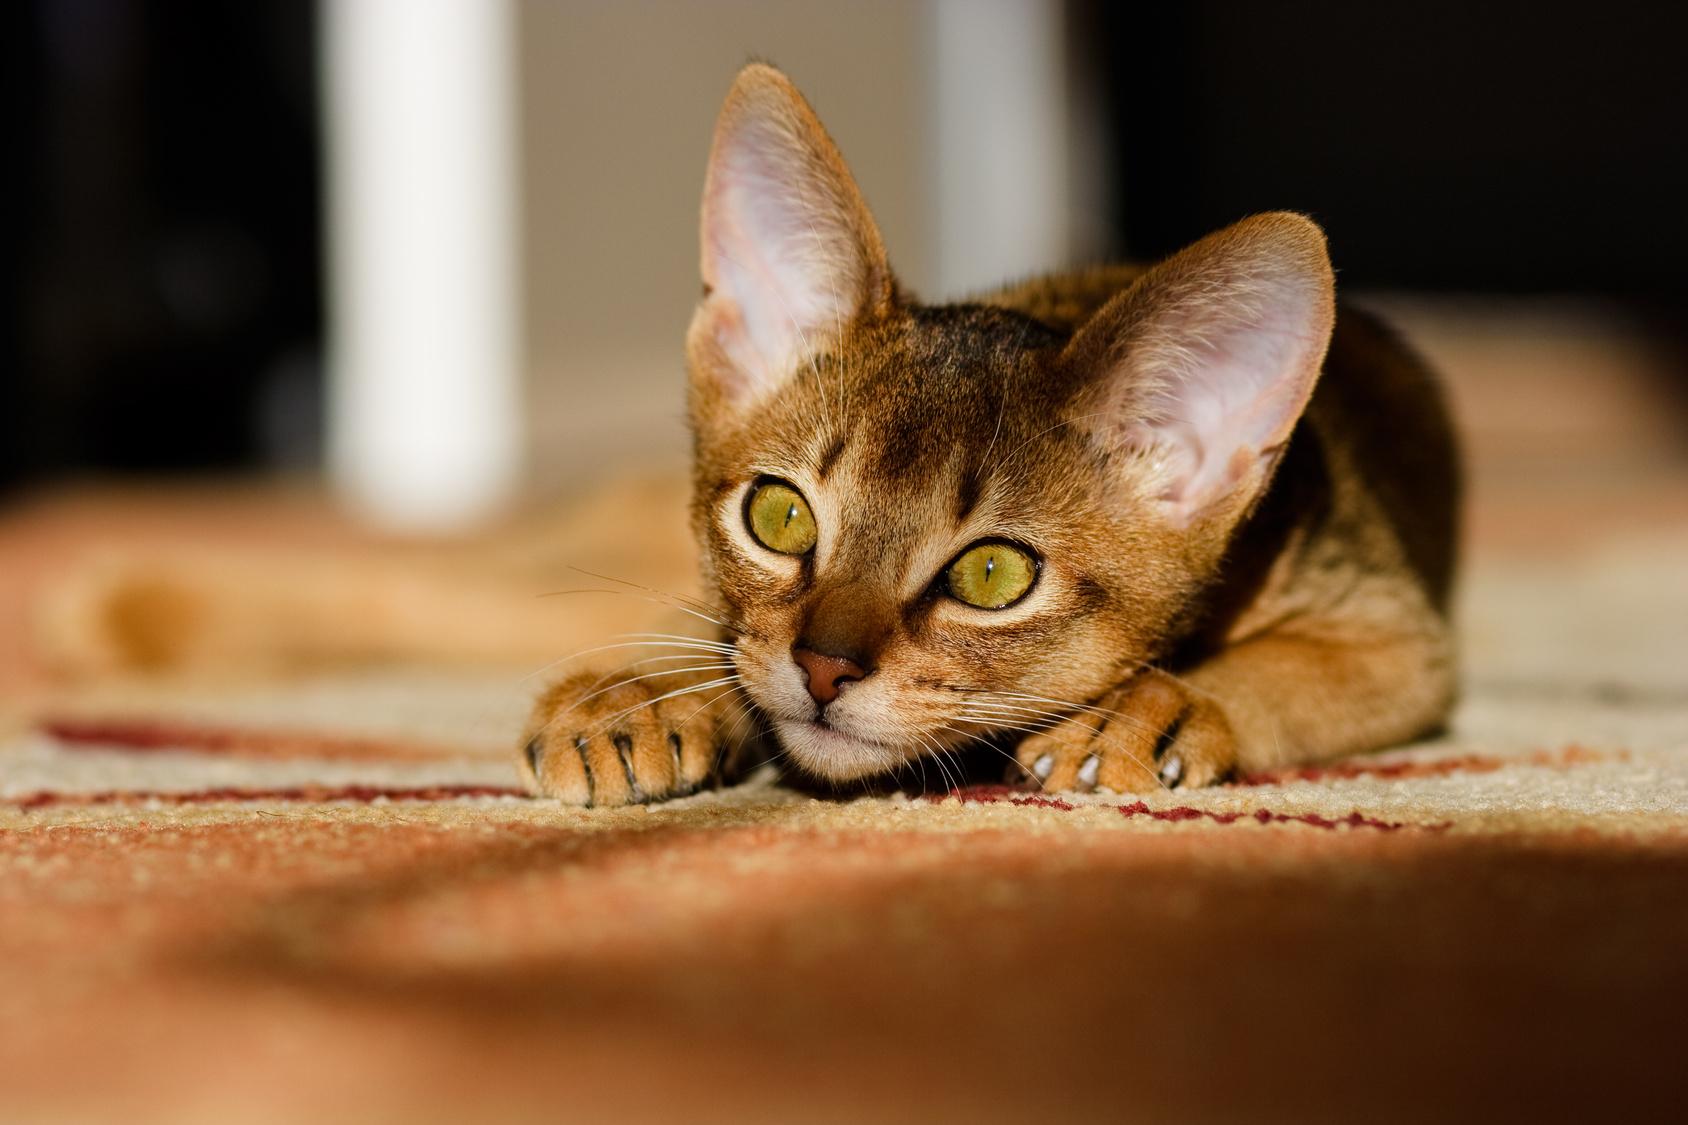 młody kot abisyński